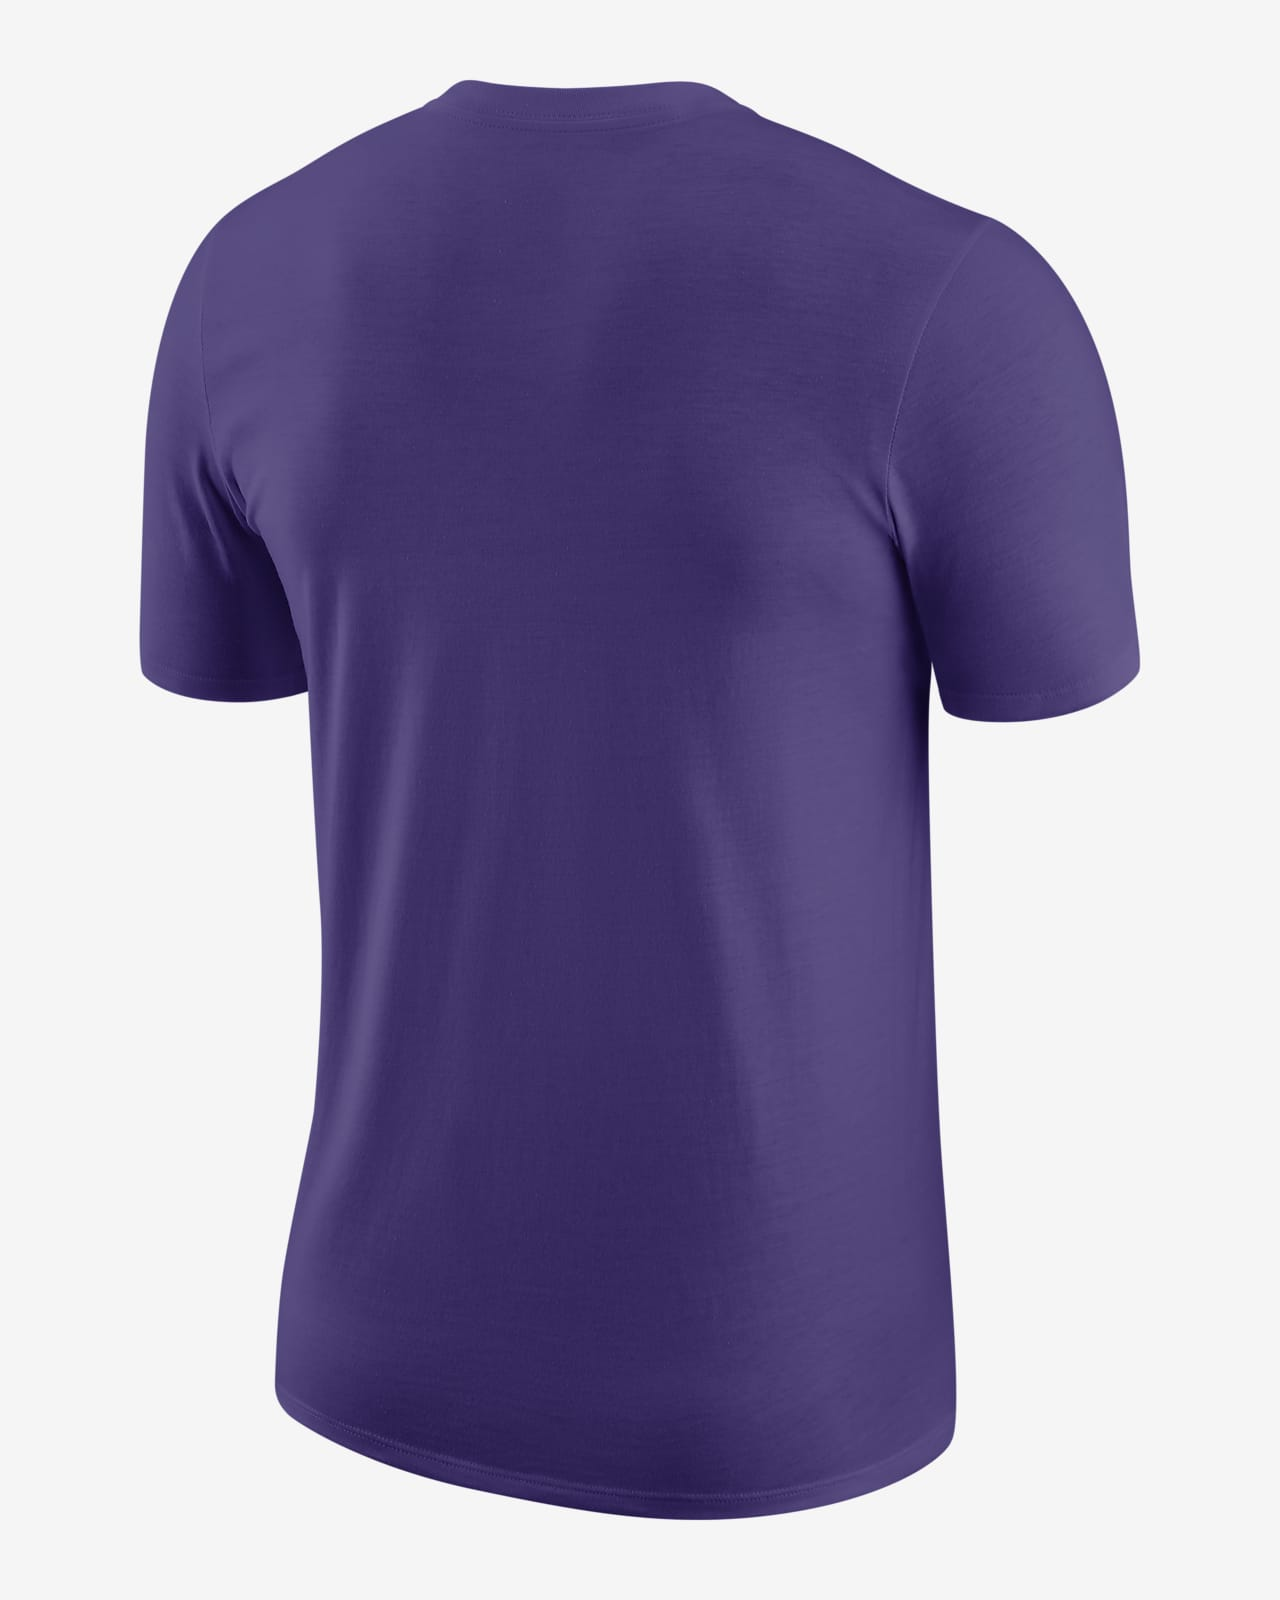 Los Angeles Lakers Logo Grid Men's Nike Dri-FIT NBA T-Shirt